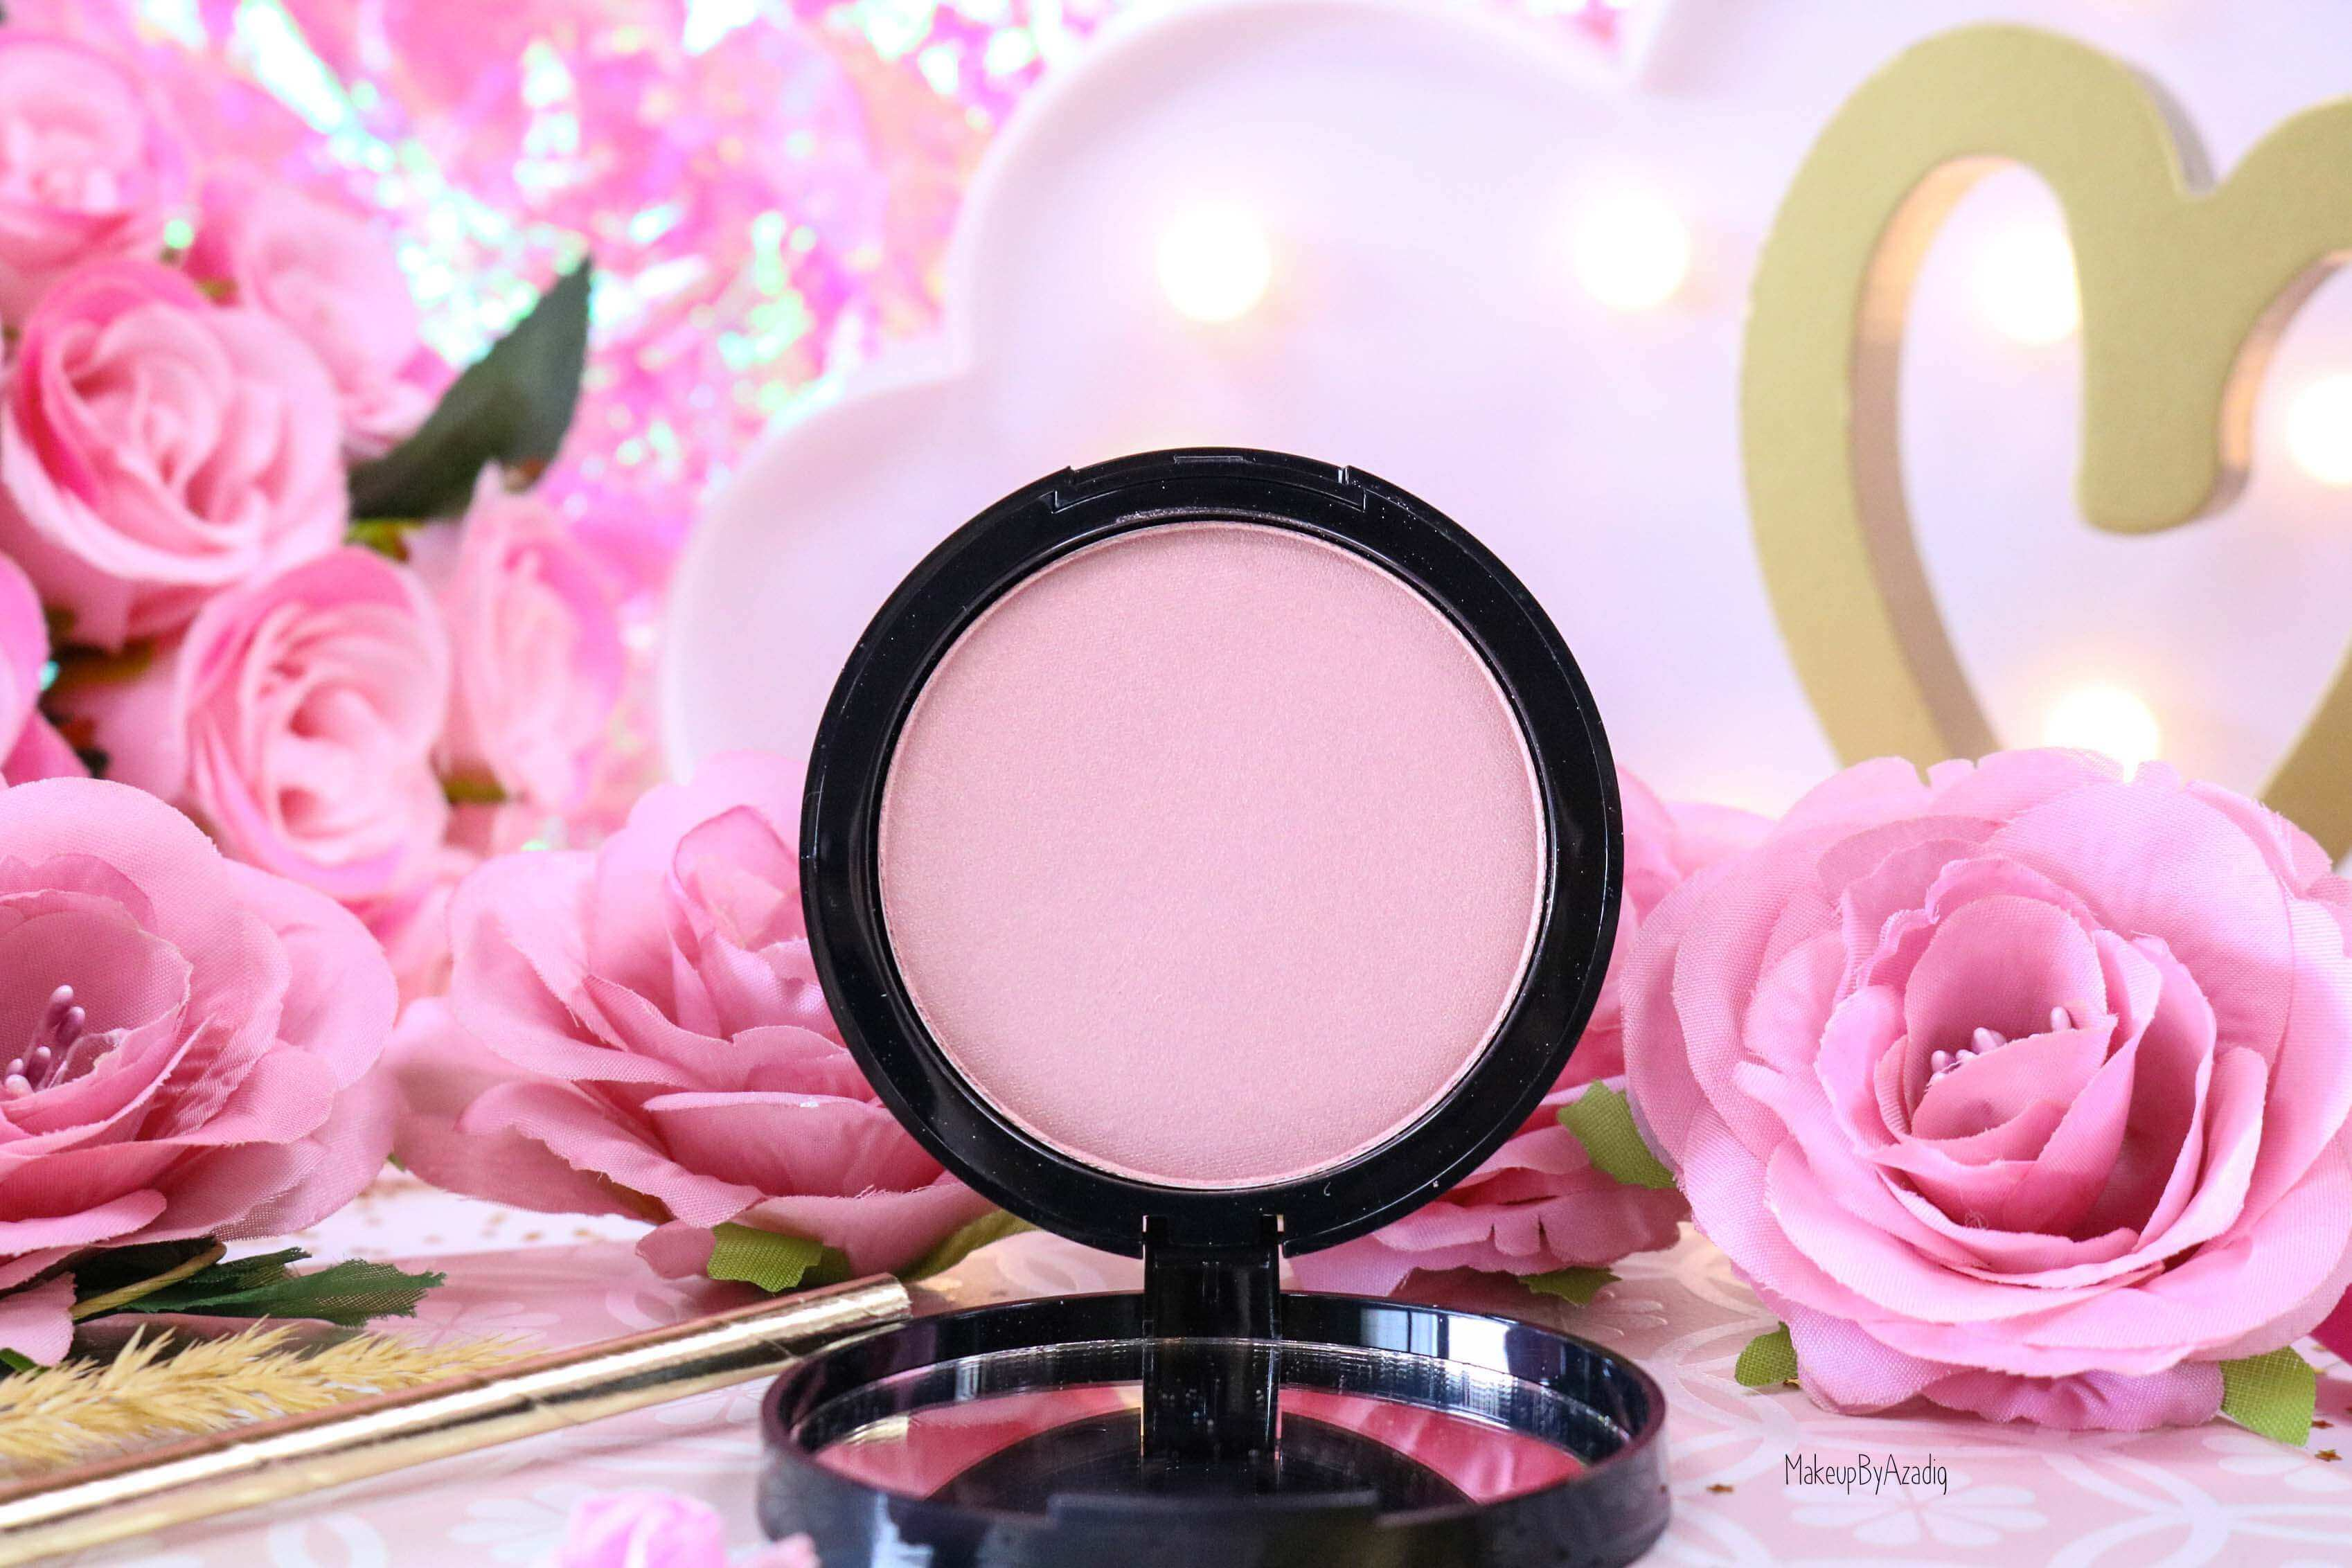 revue-highlighter-poudre-illuminatrice-golden-hour-dusk-sephora-collection-rosegold-avis-prix-swatch-makeupbyazadig-powder